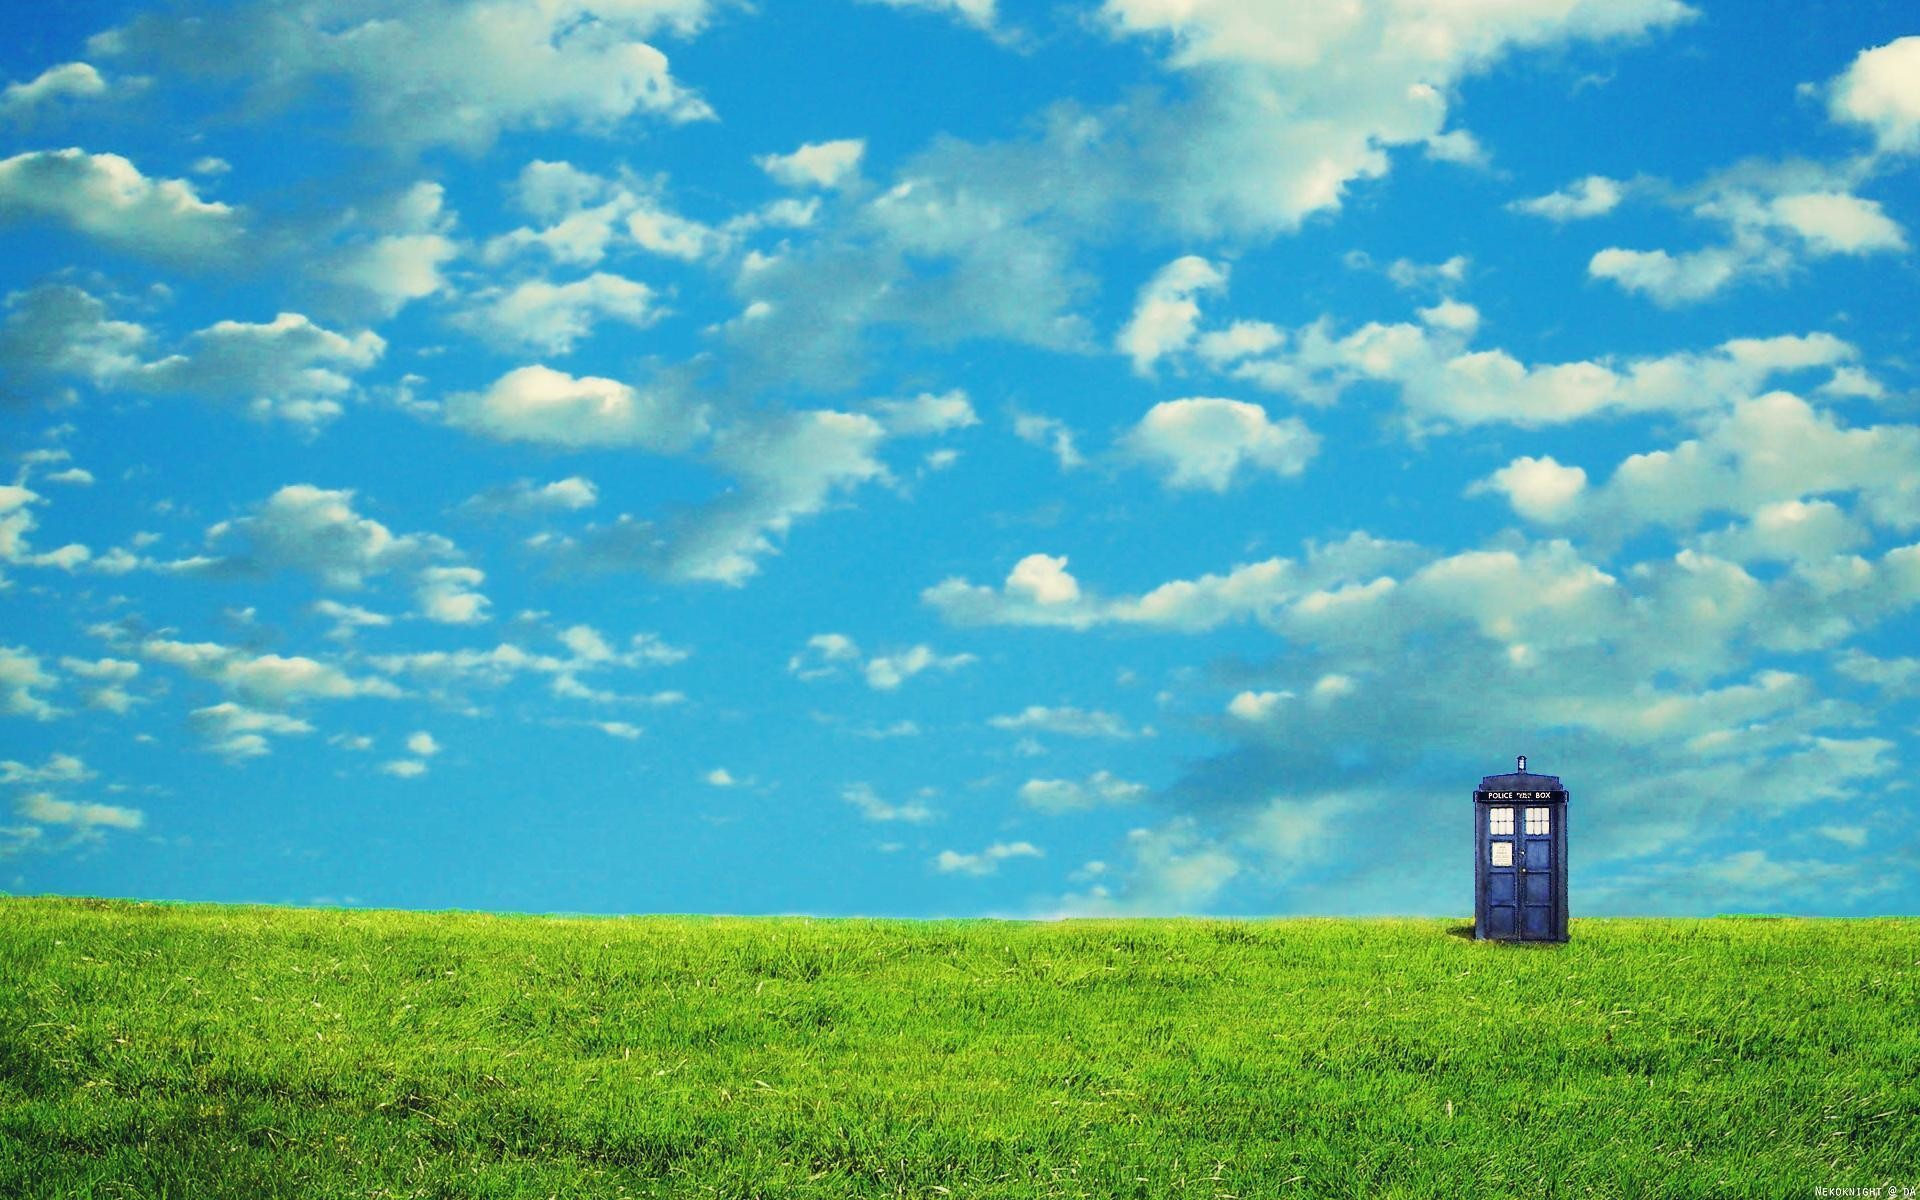 Doctor Who TARDIS Desktop Wallpaper